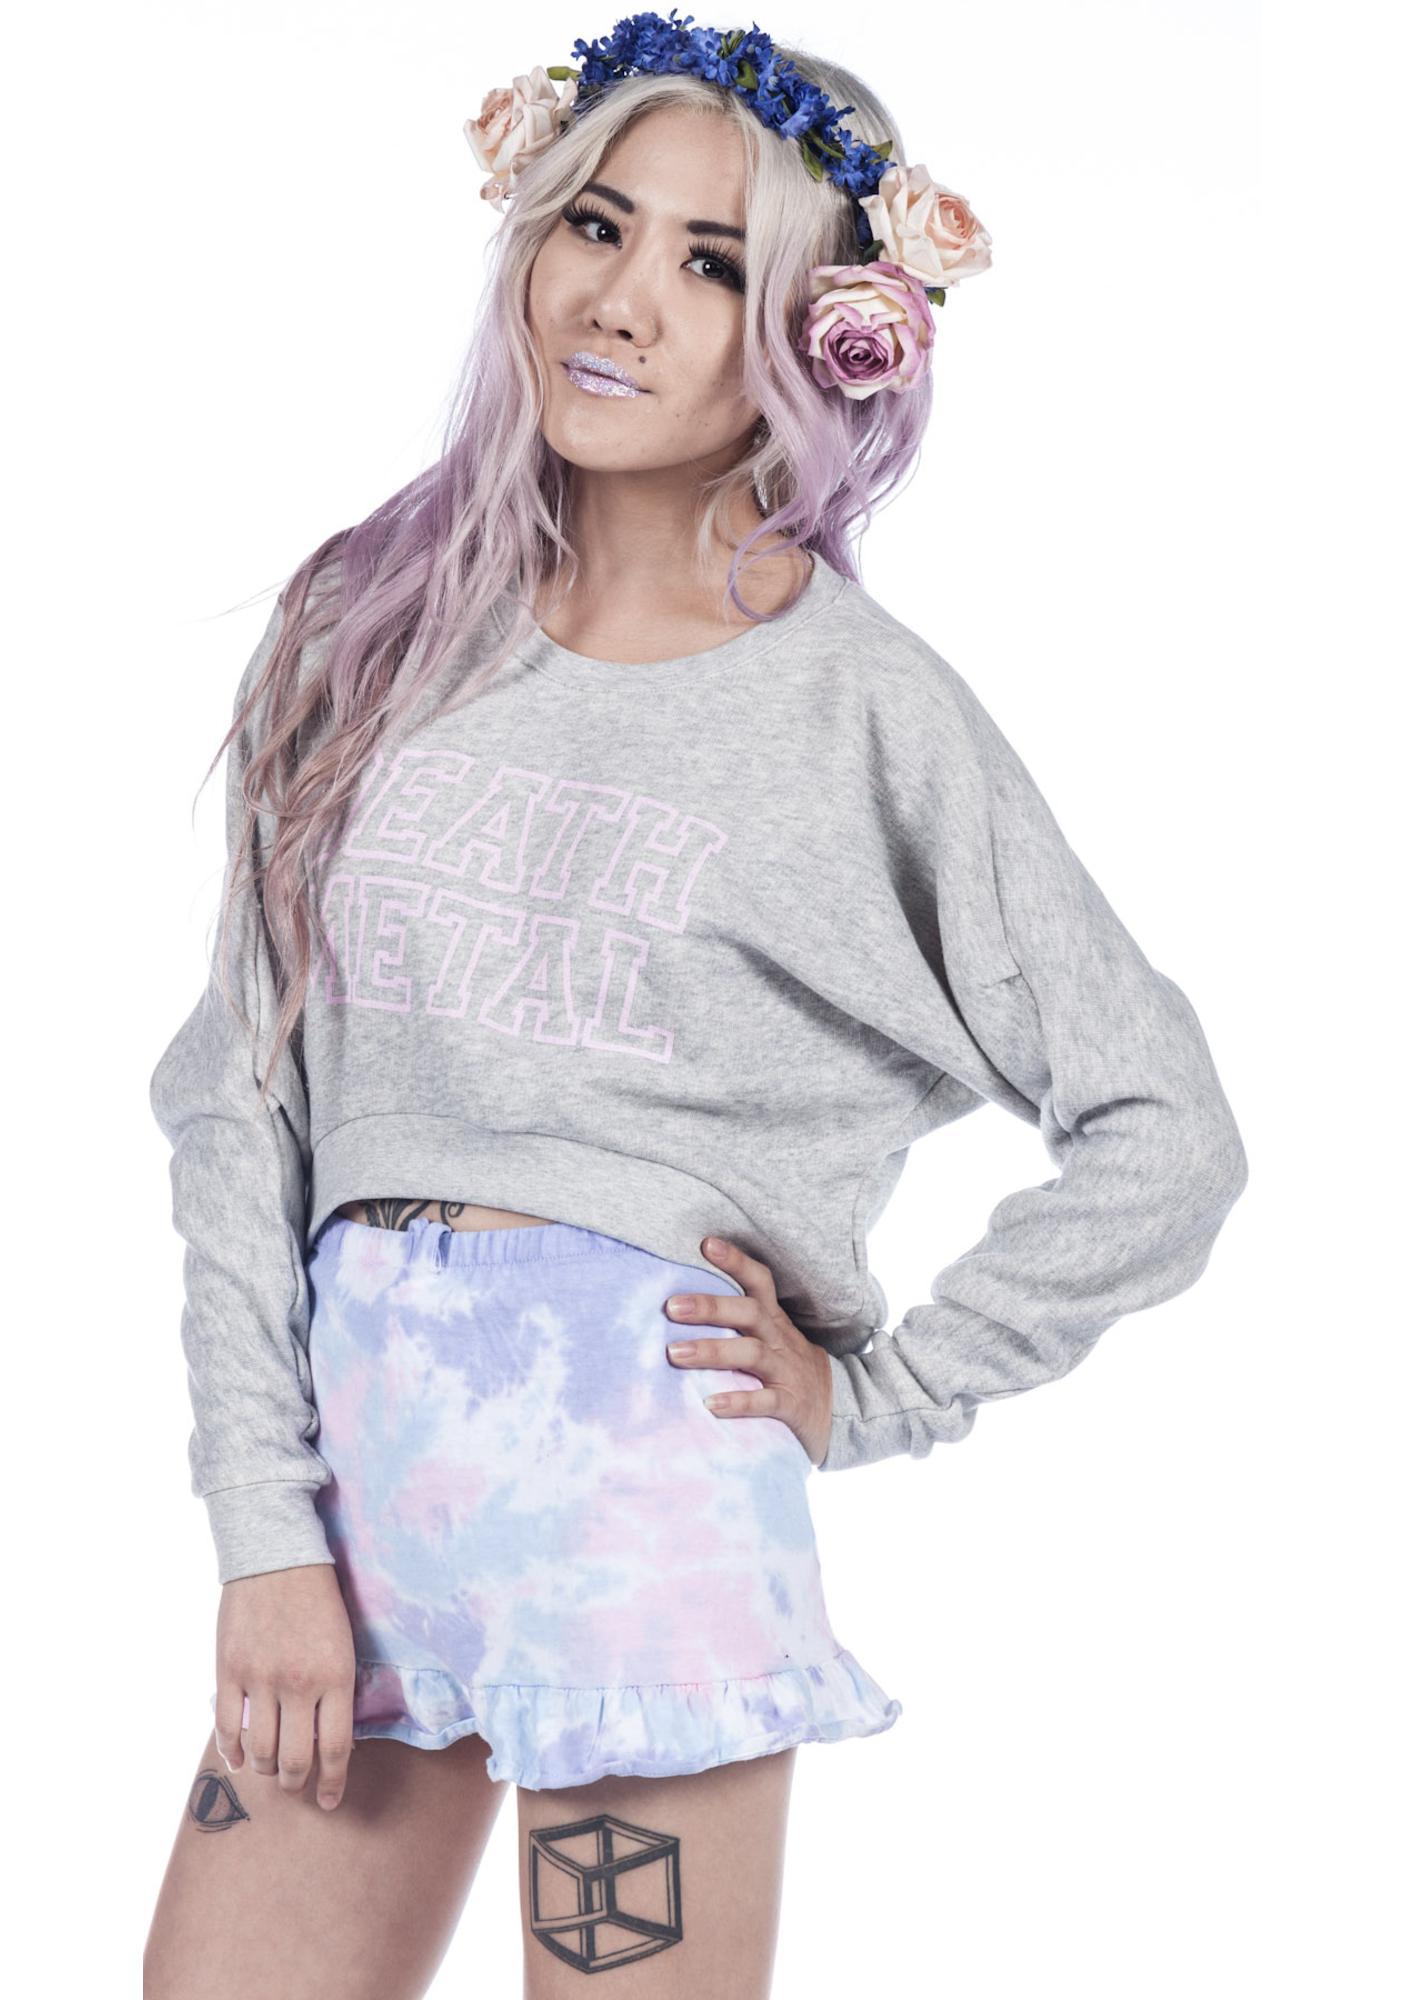 Joyrich Death Metal Cropped Crew Sweatshirt